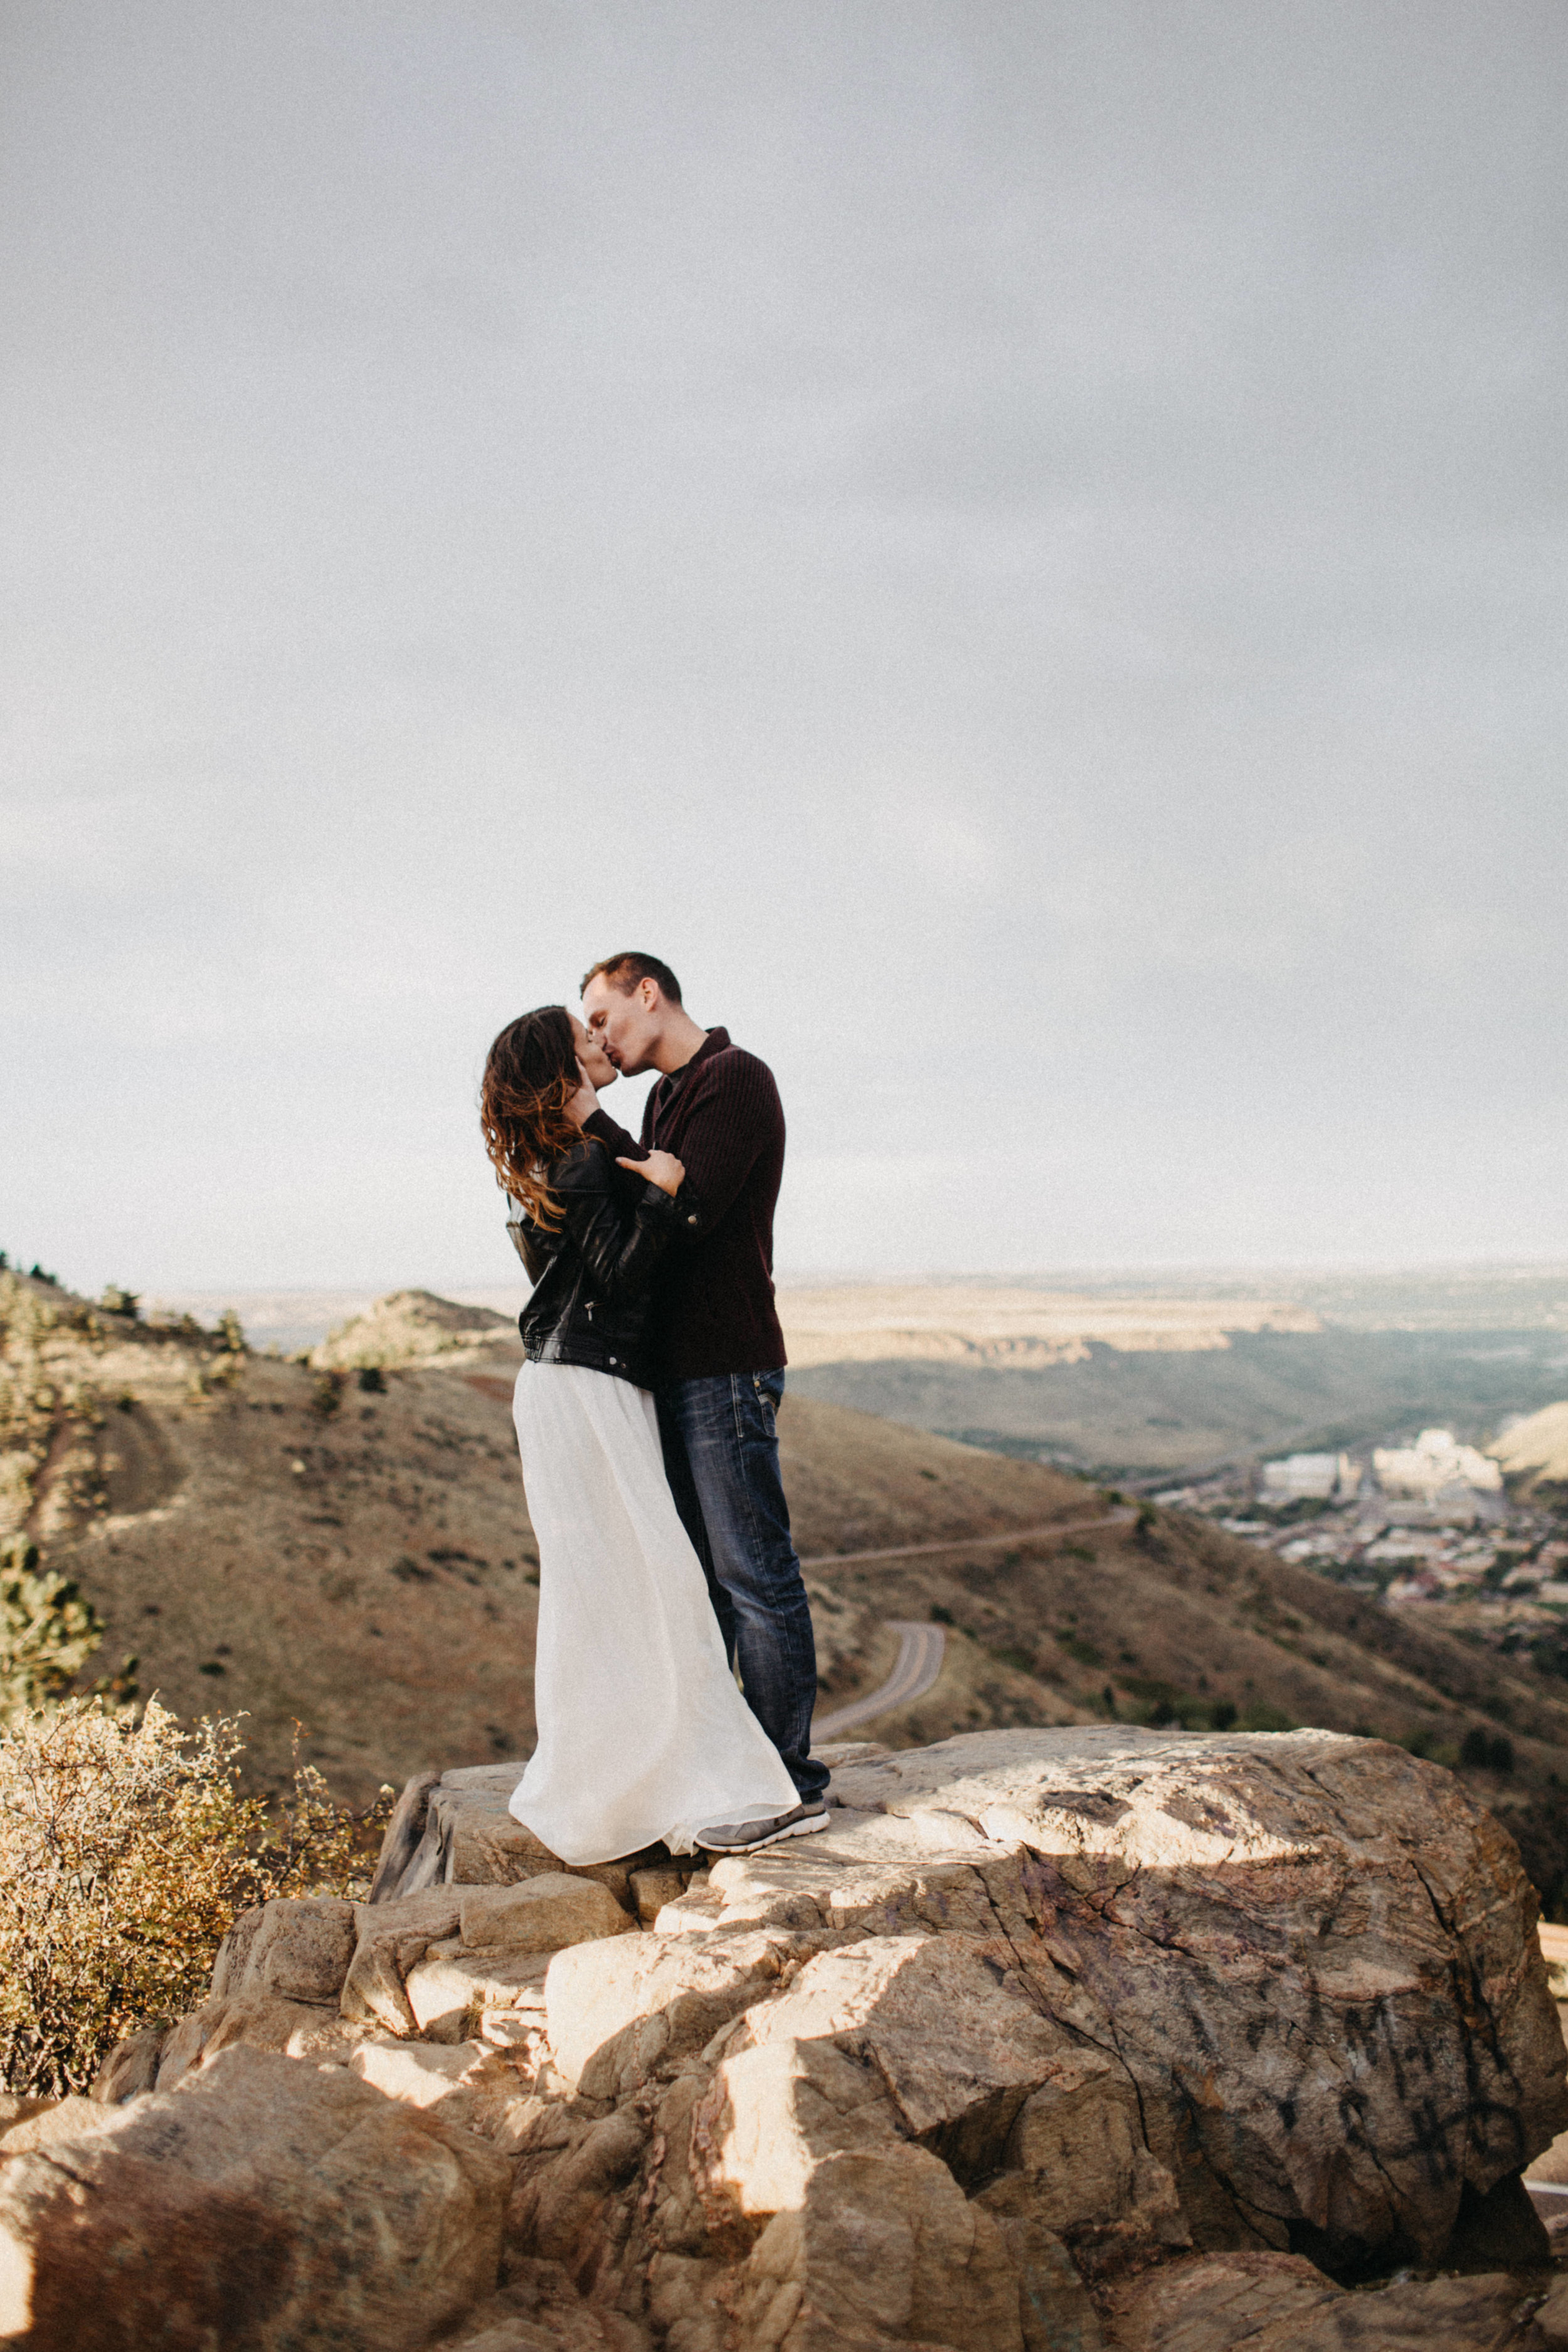 Destination Elopement Photographers at Lookout Mountain, Colorado